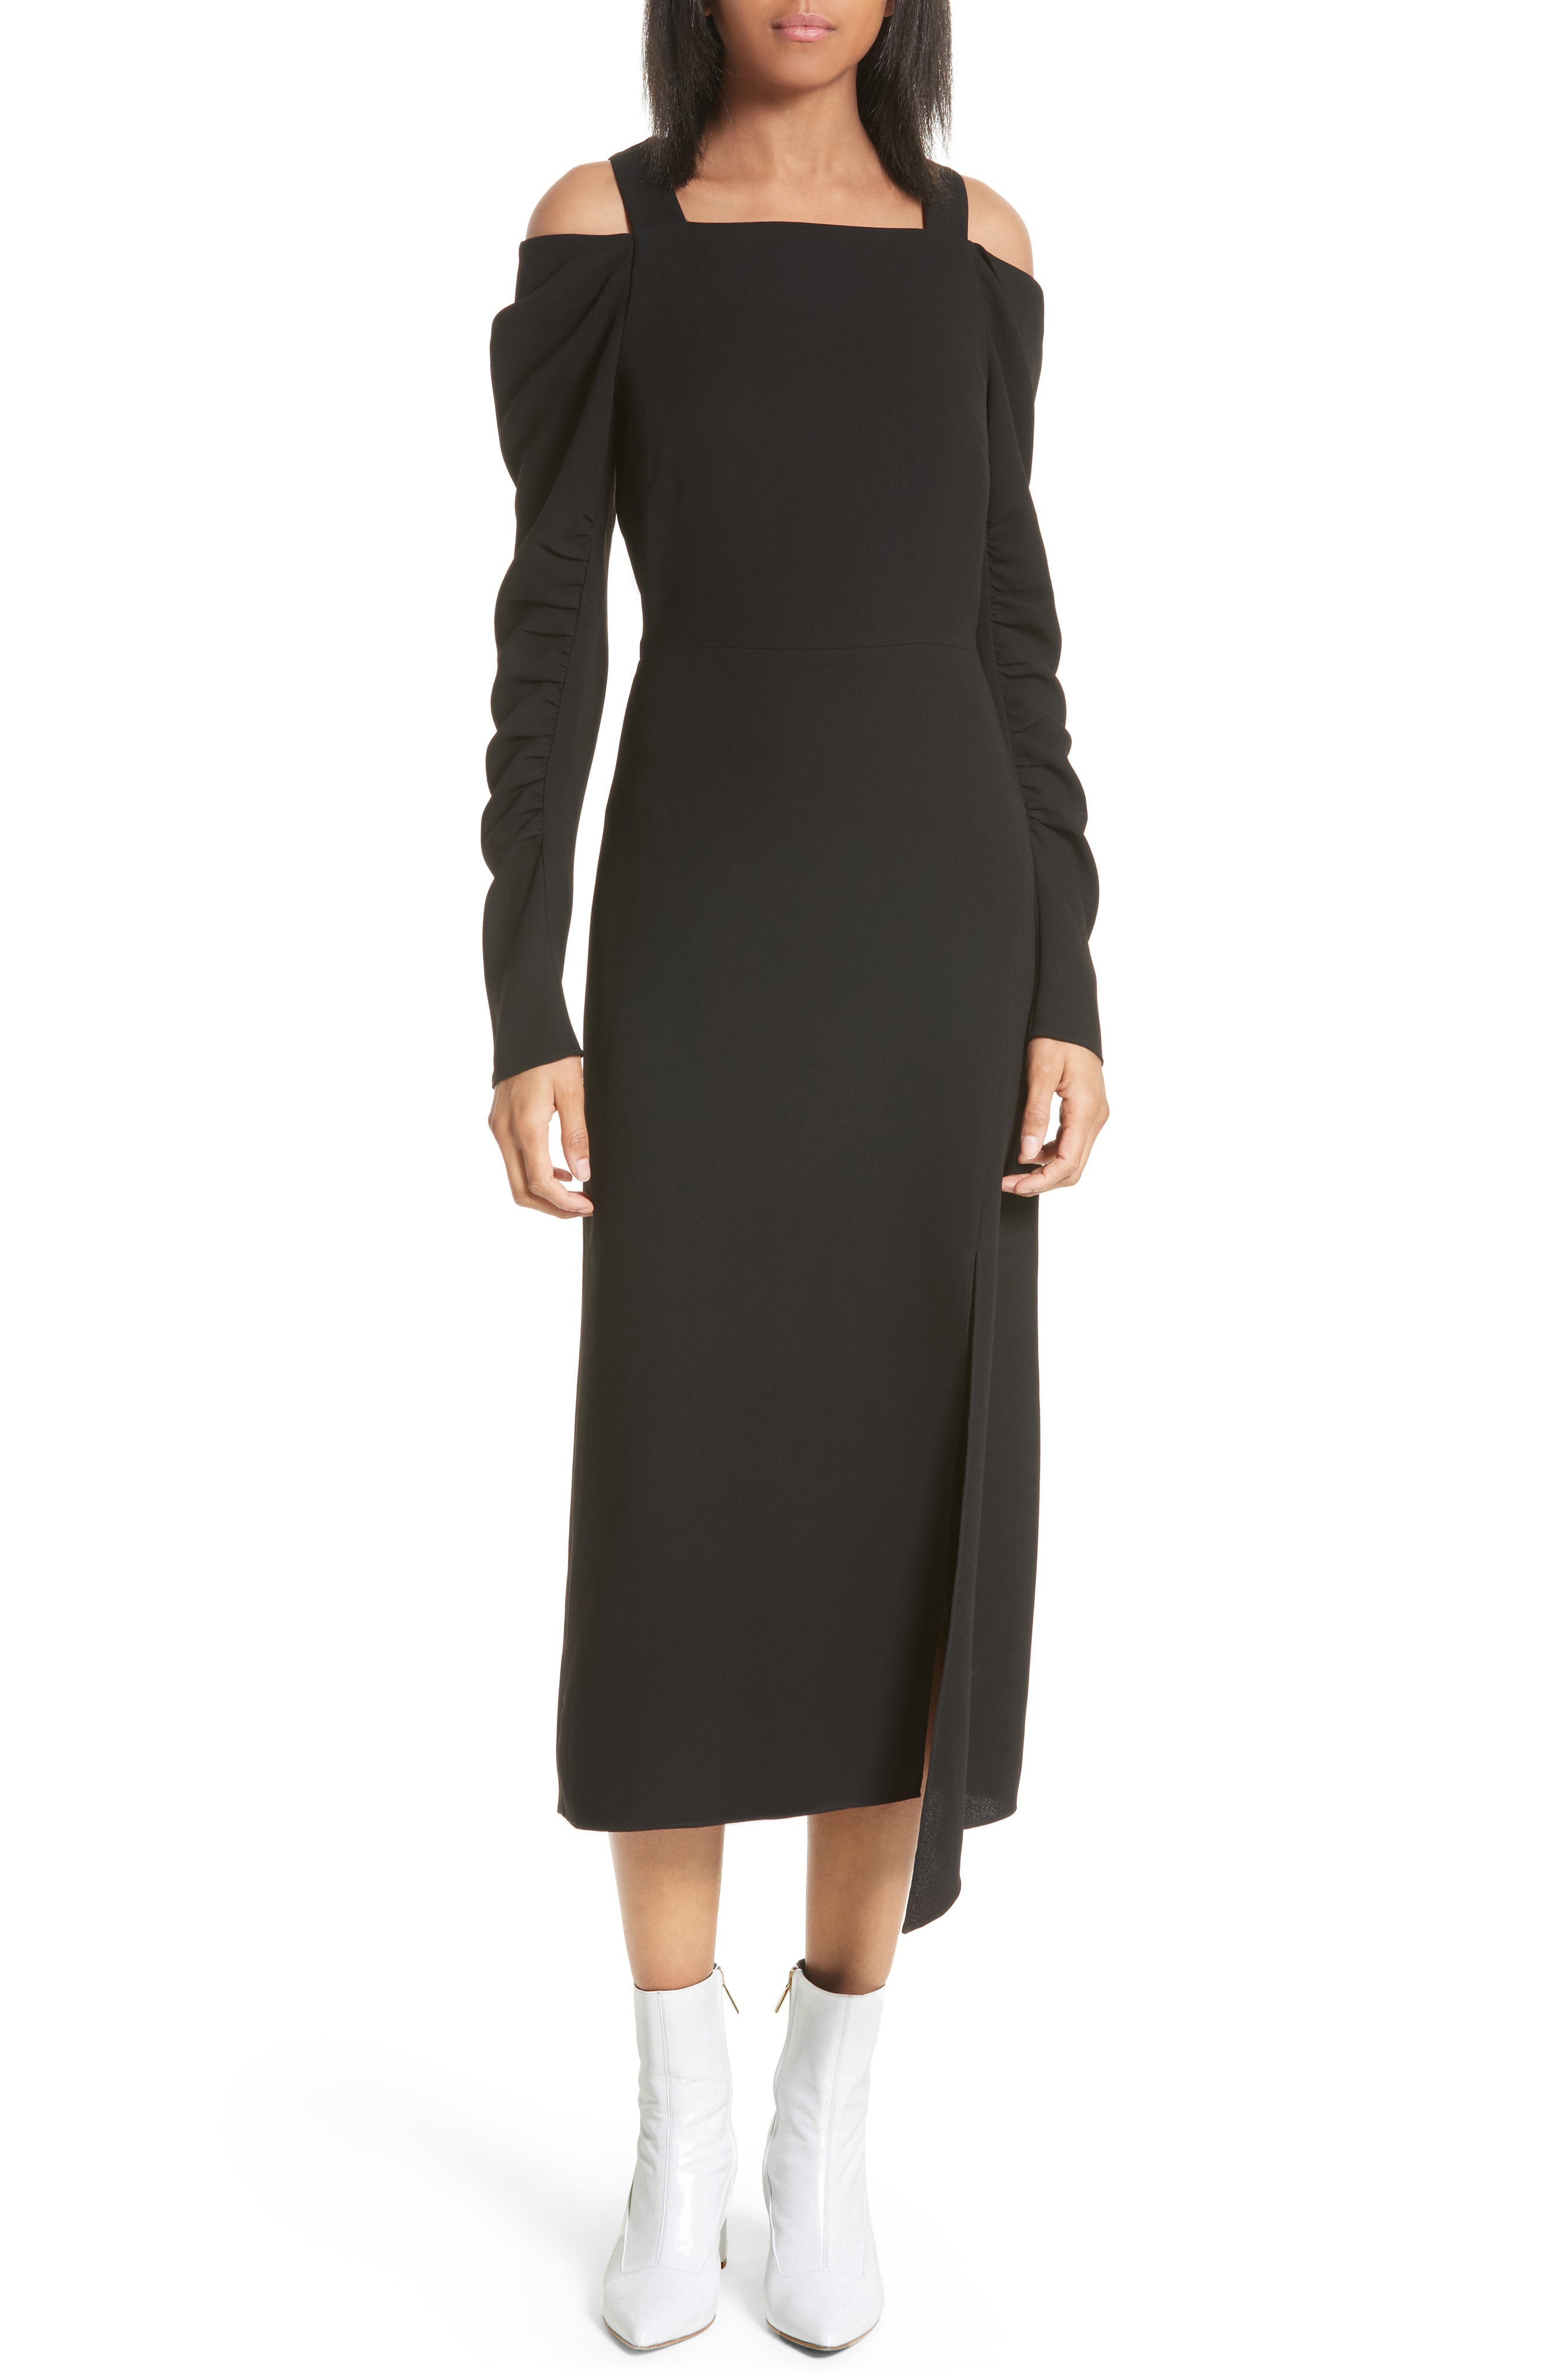 Cold Shoulder Midi Dress,                             Main thumbnail 1, color,                             Black